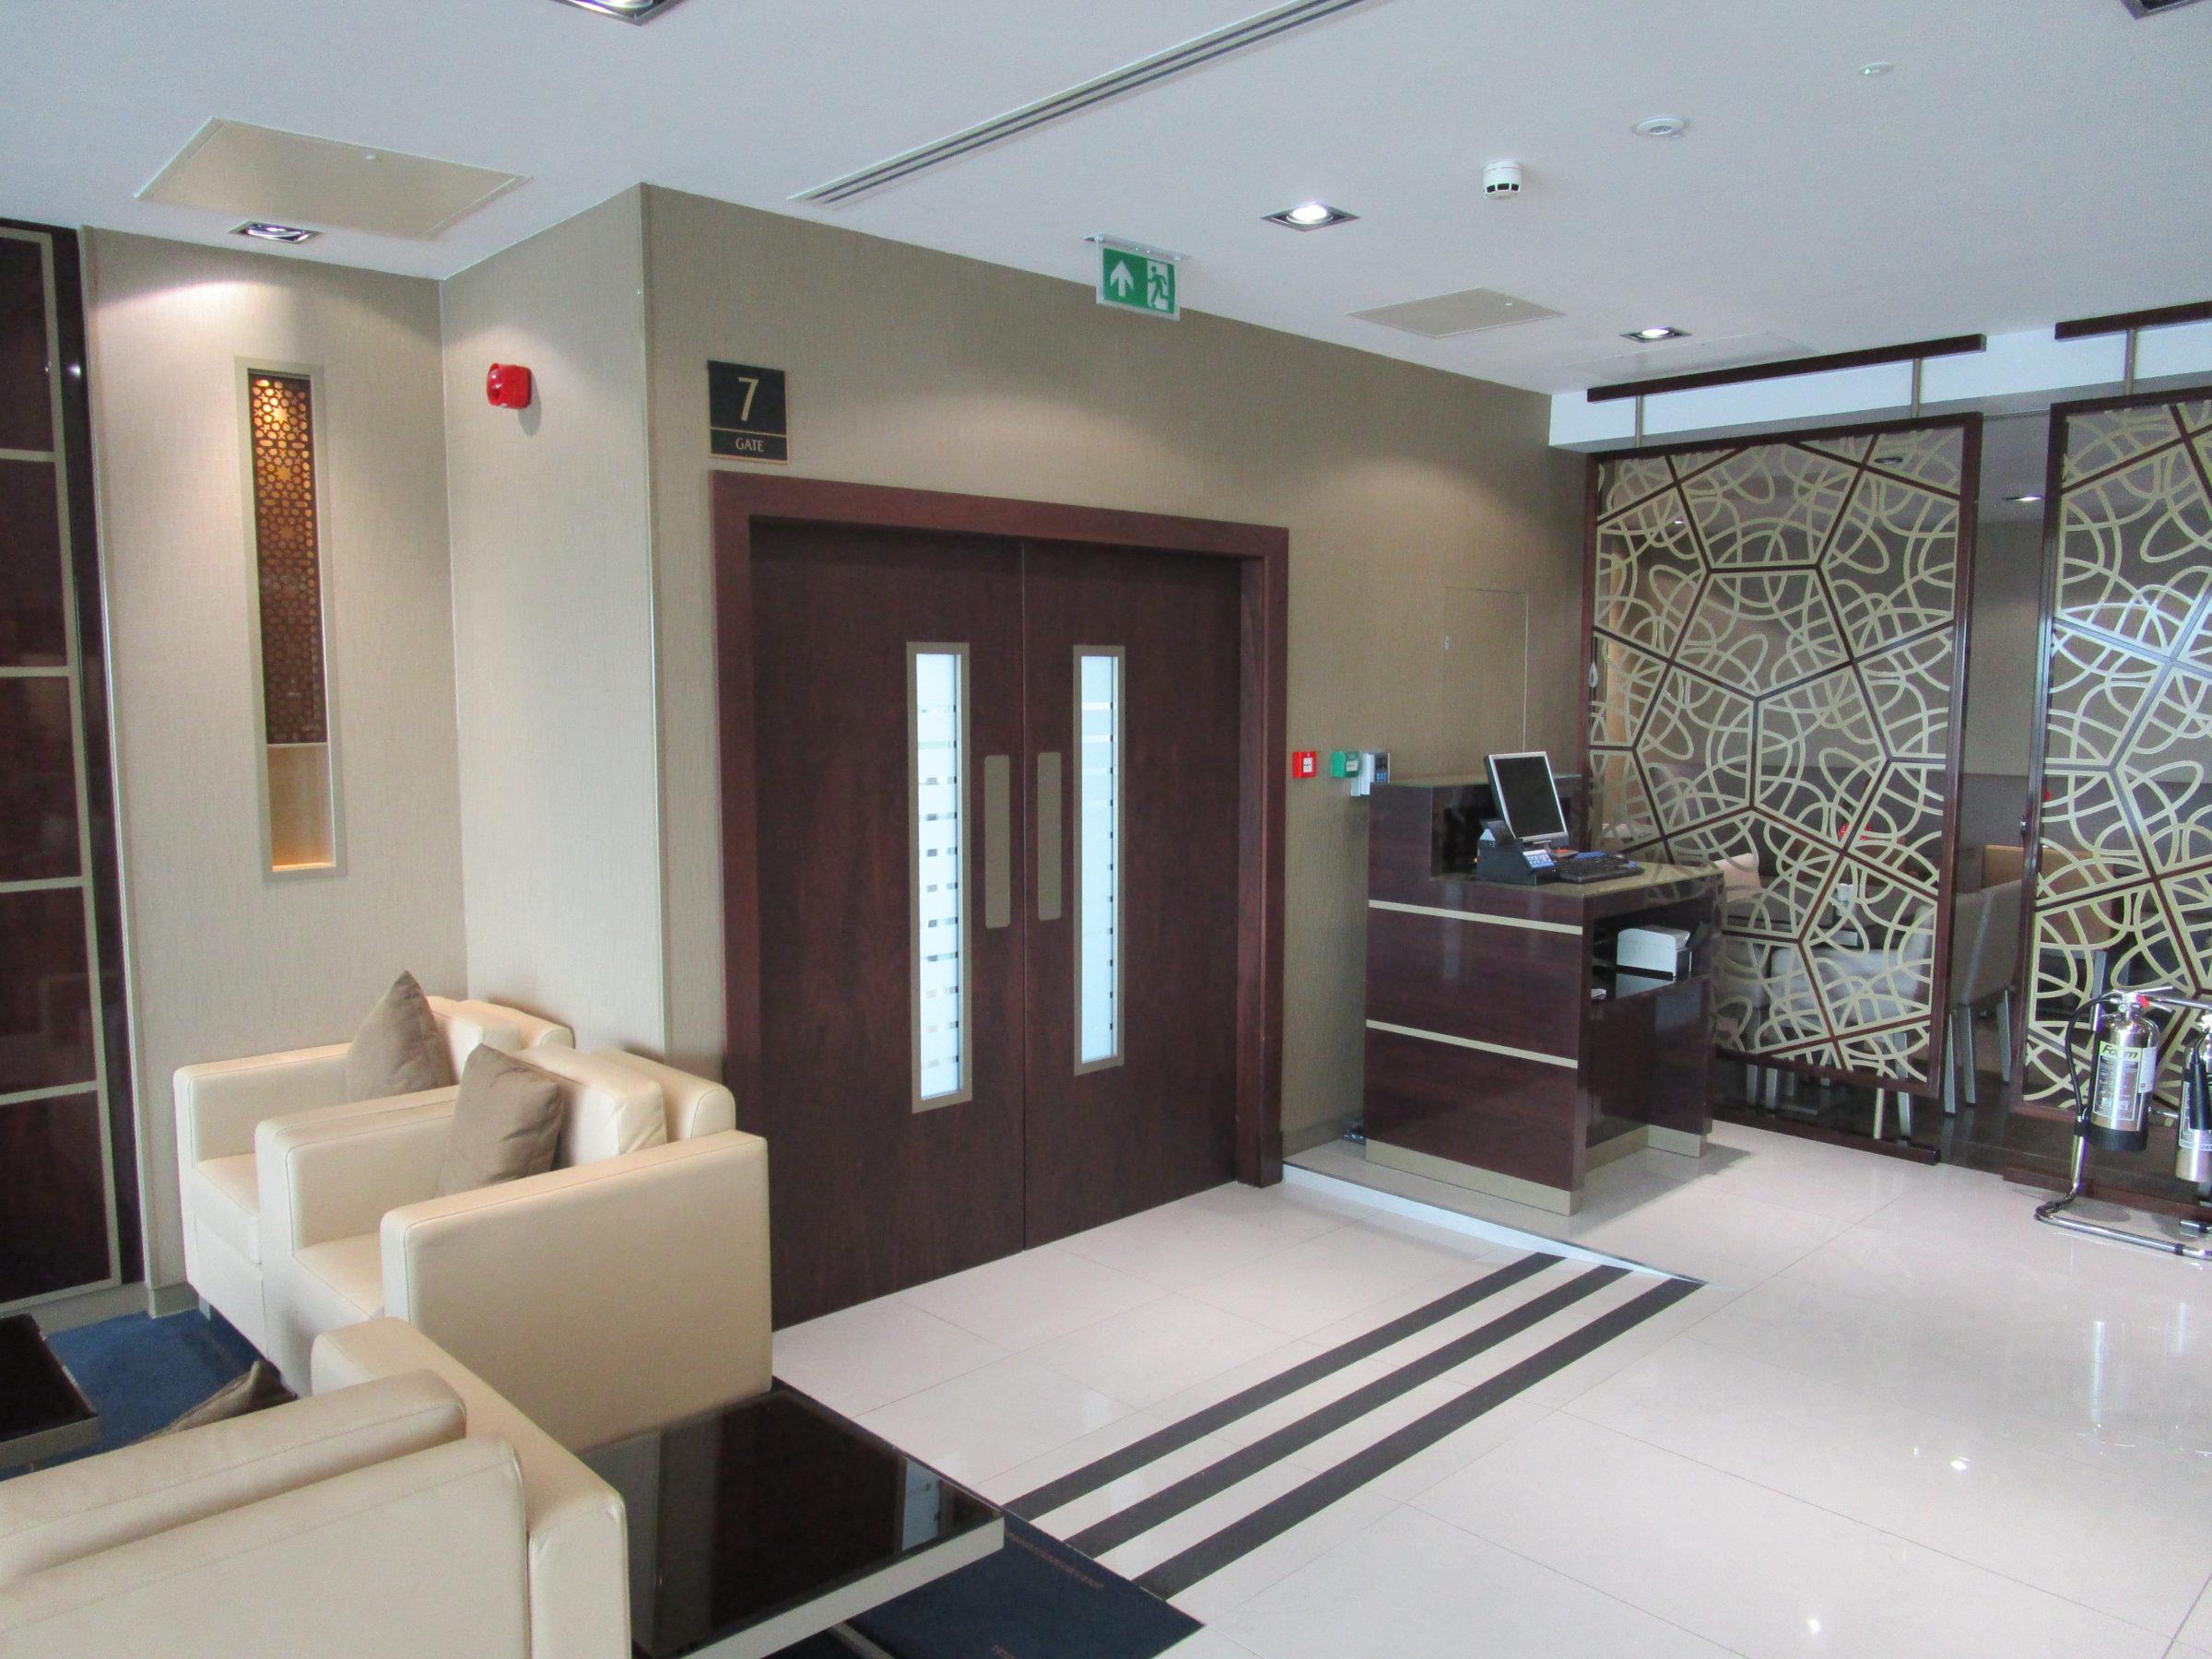 Emirates Lounge, Heathrow